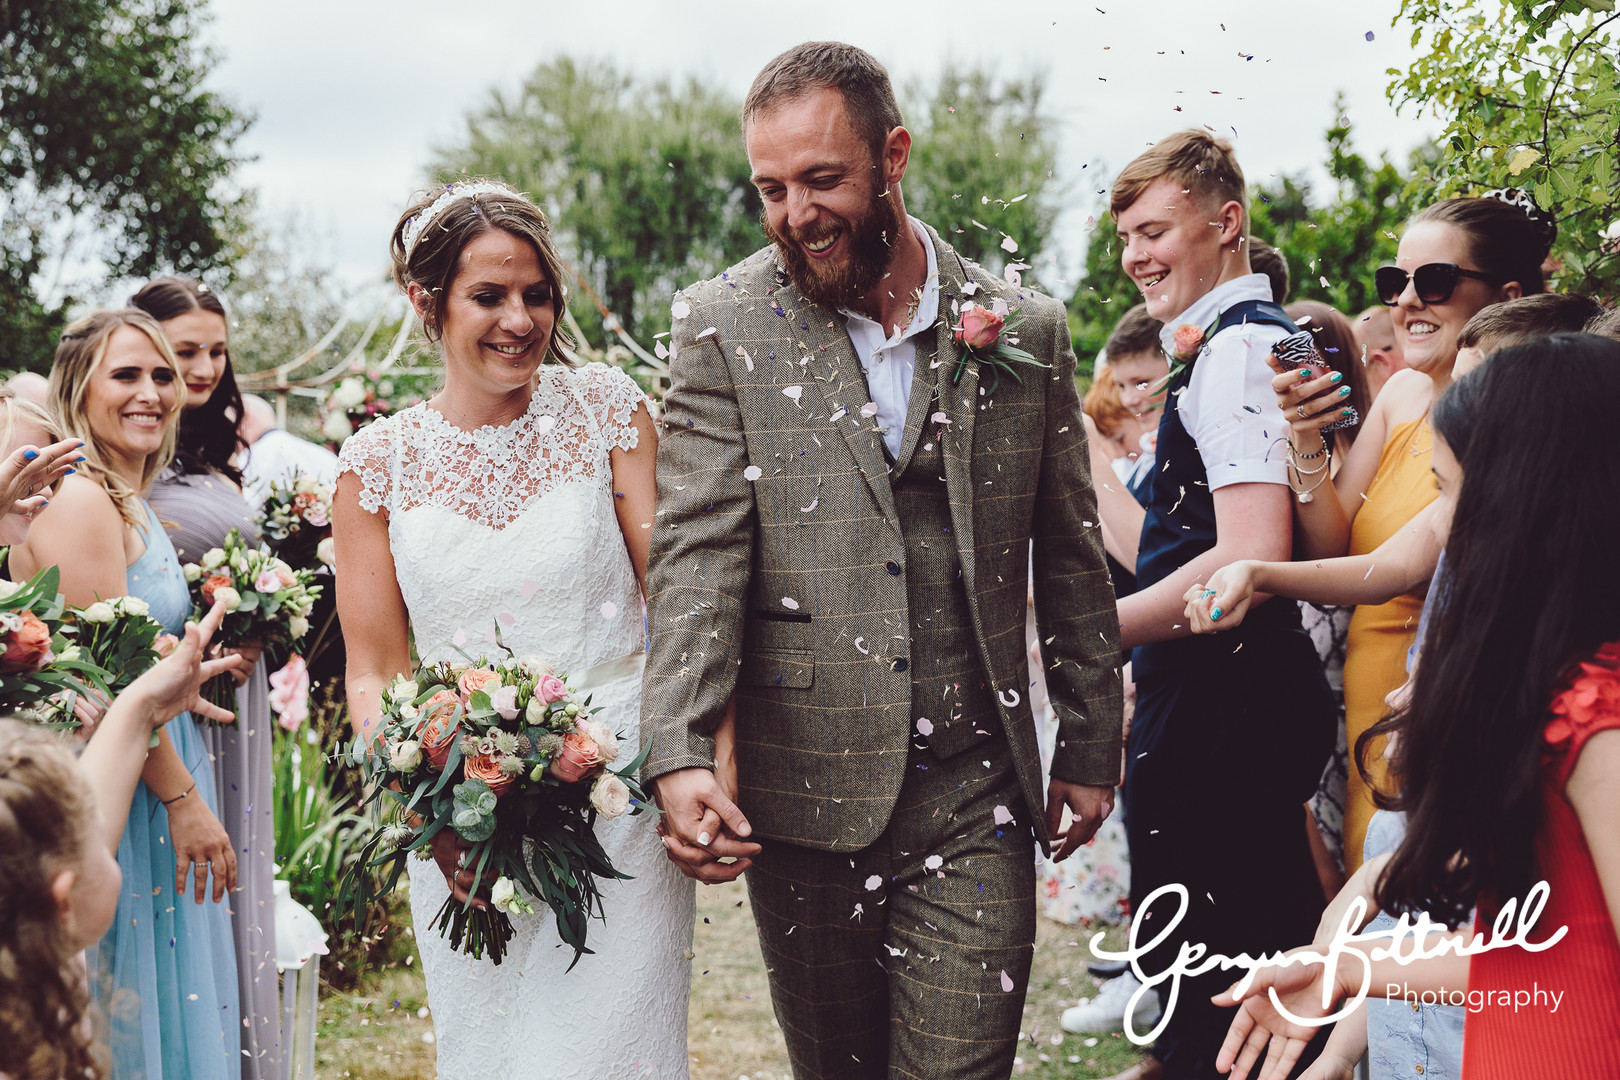 Isle of Wight Wedding Photographer Georg